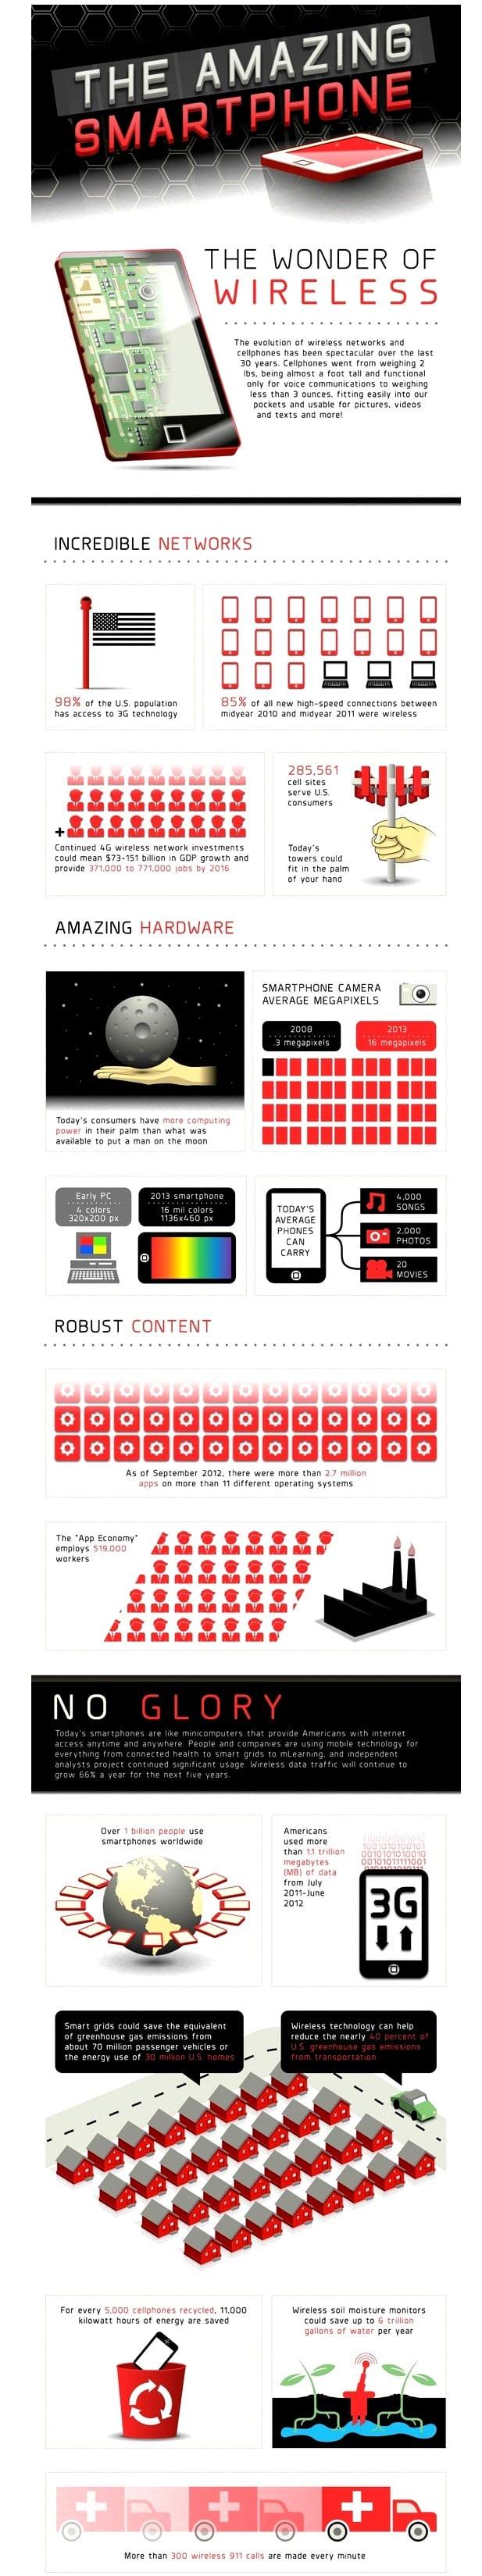 http://phoneworld.com.pk/wp-content/uploads/2013/03/smartphones.jpg